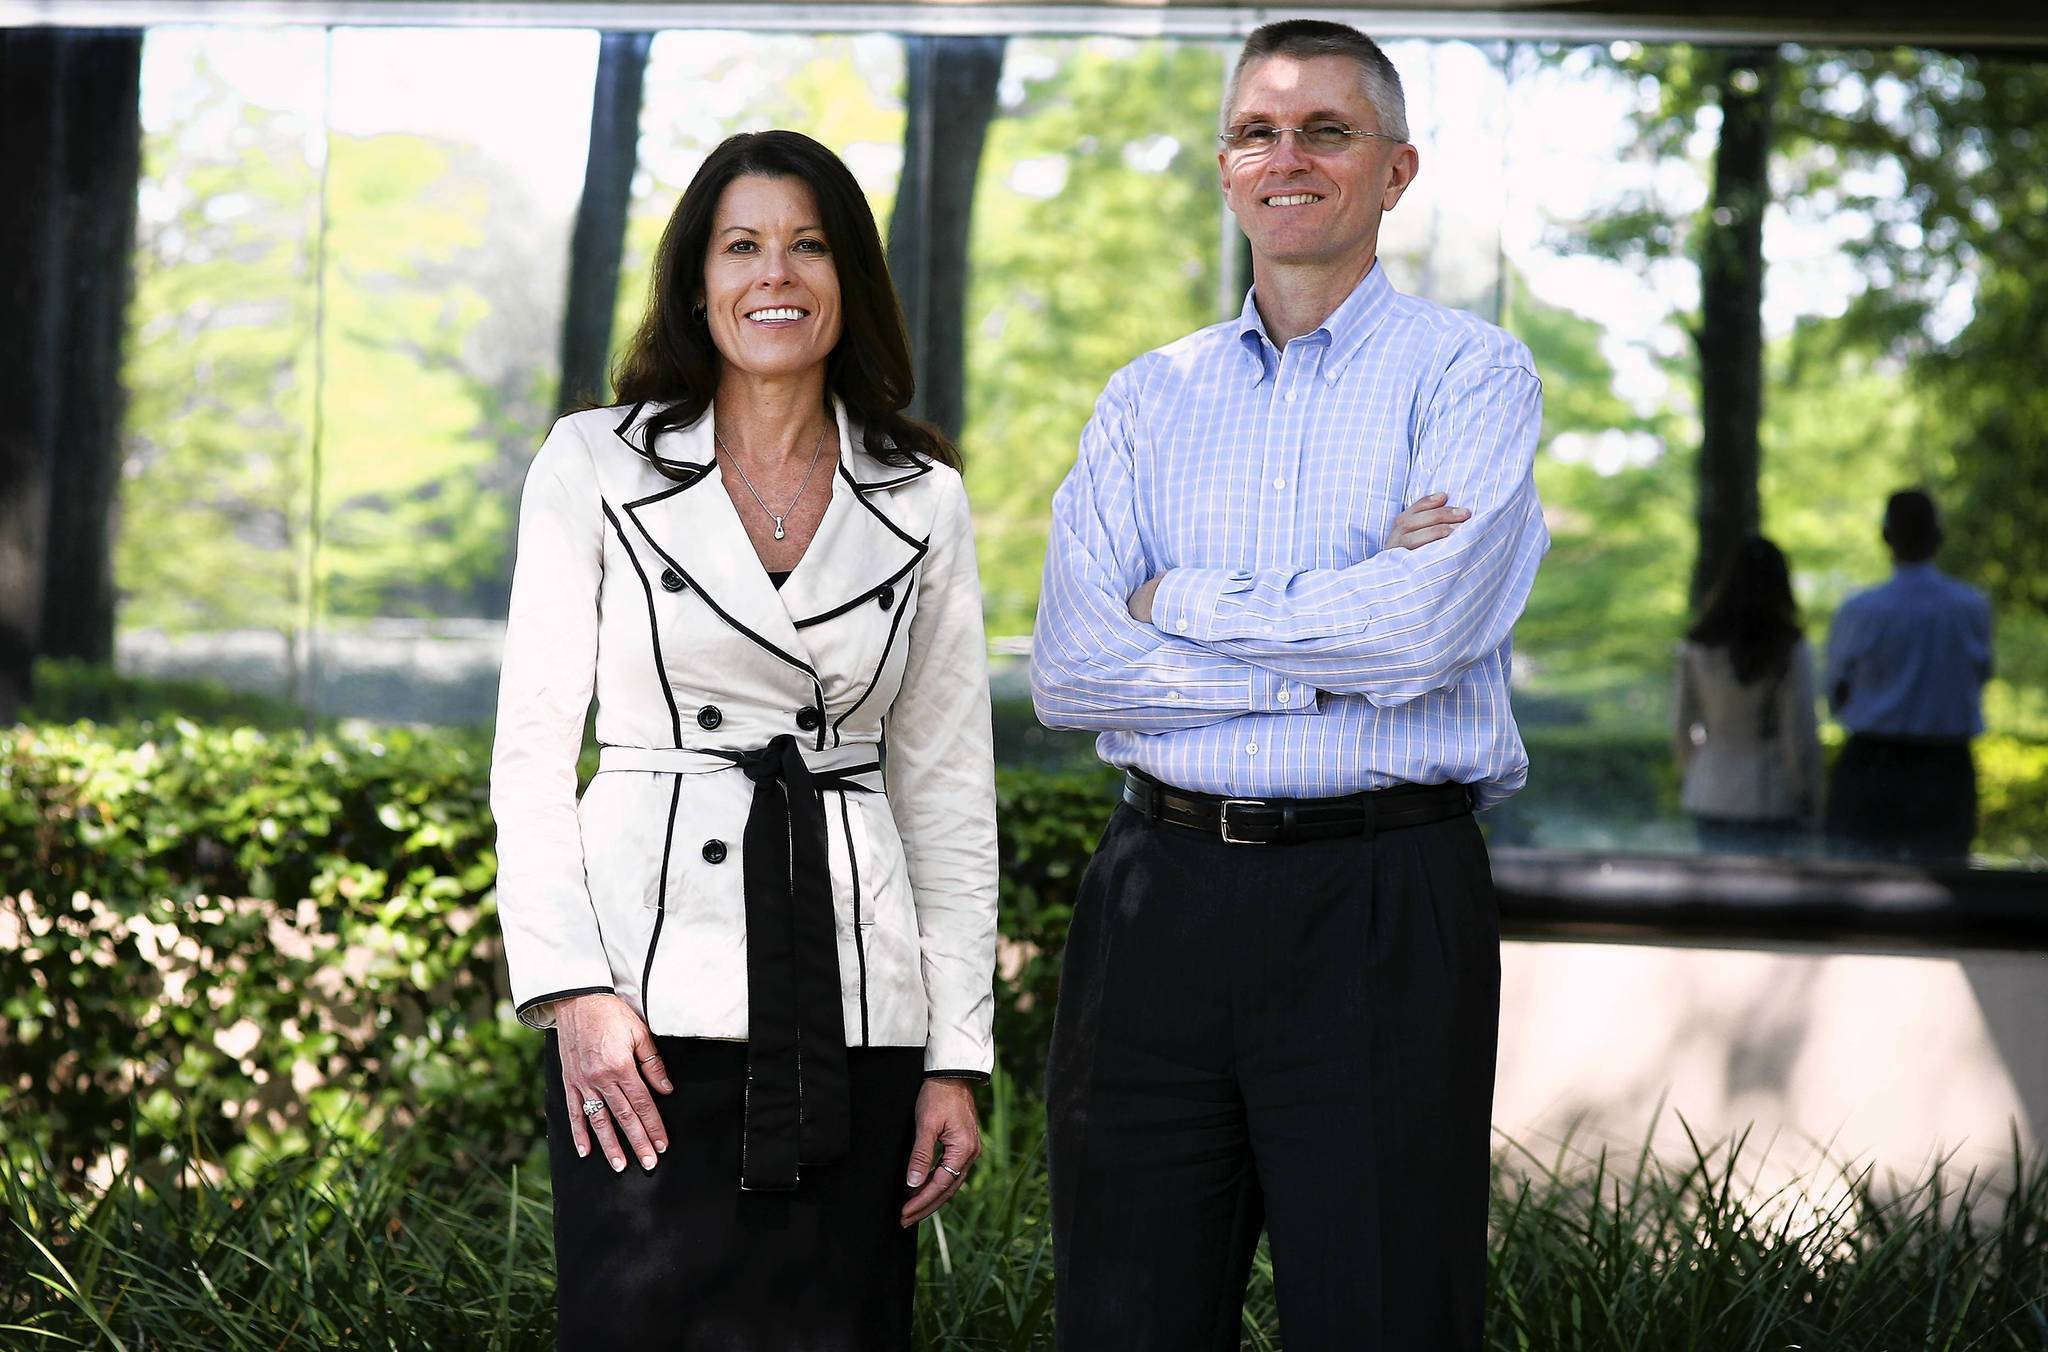 Shari Dingle Sandifer, CEO of Avant Healthcare, and Spencer Lloyd, the companys CFO, at their Casselberry office.